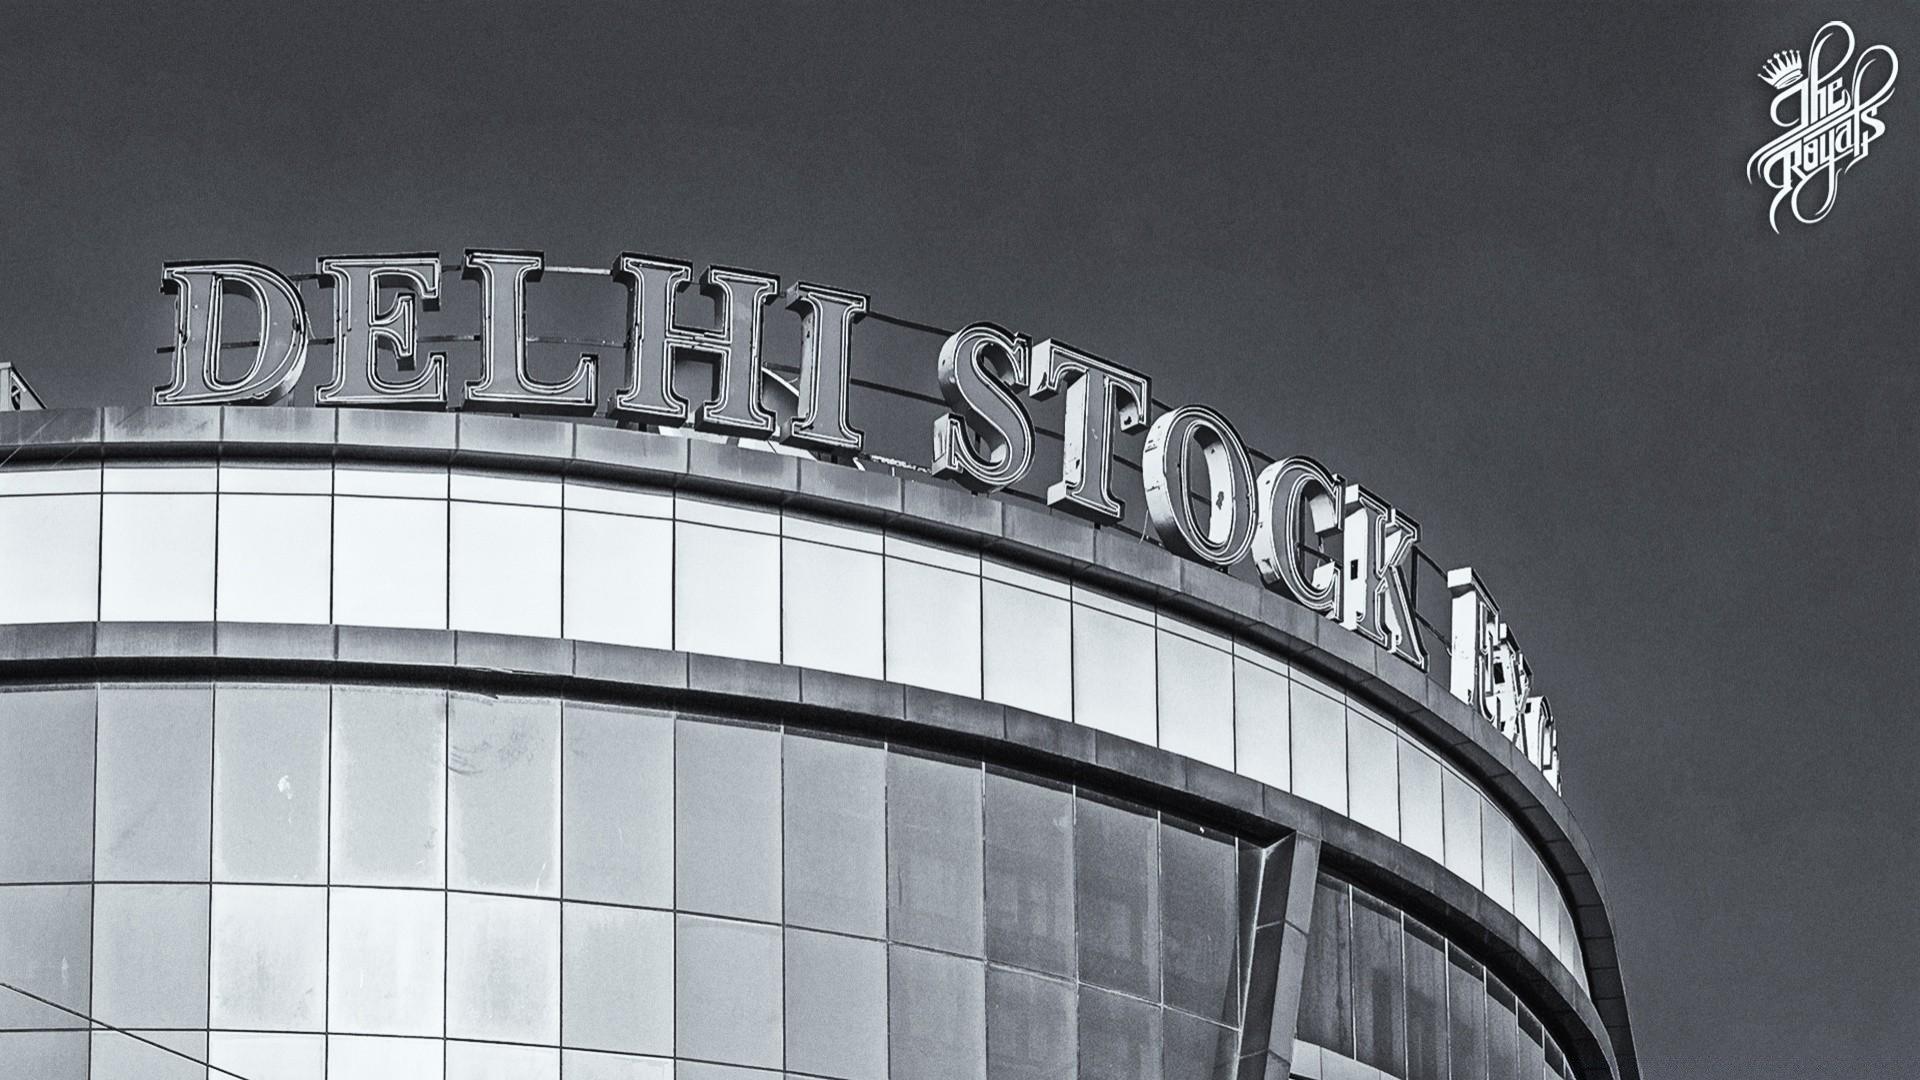 wallpapers office delhi. Delighful Wallpapers To Wallpapers Office Delhi 9